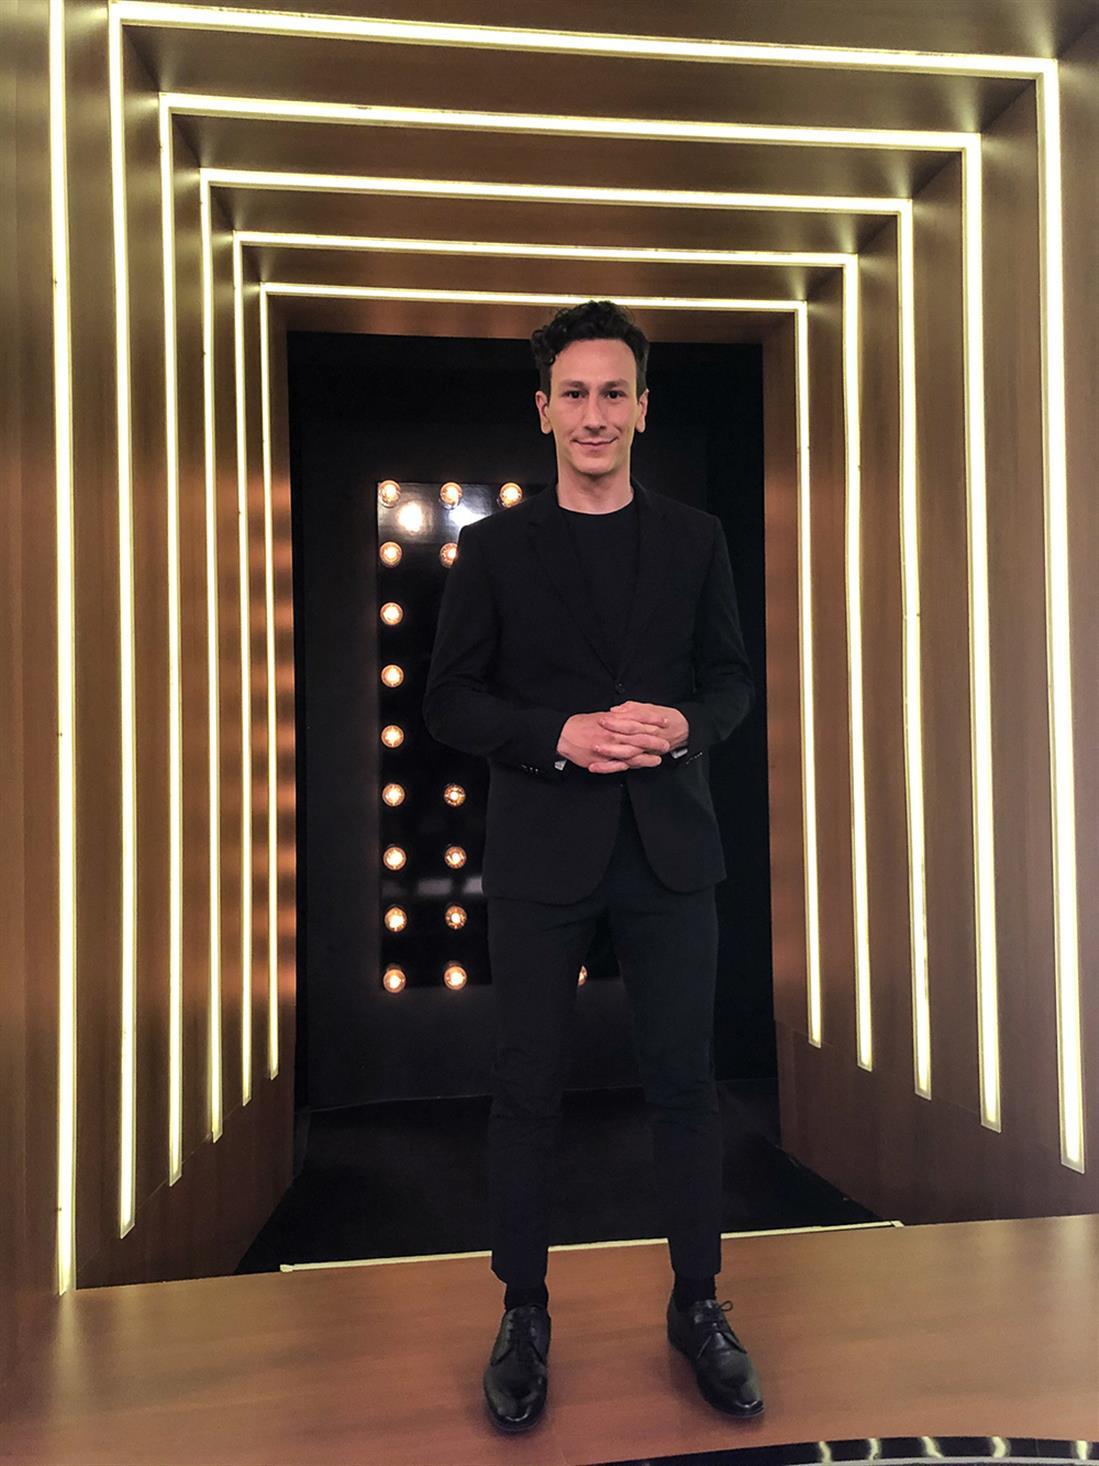 The 2Night Show - Γρηγόρης Αρναούτογλου - Μιχάλης Σαράντης